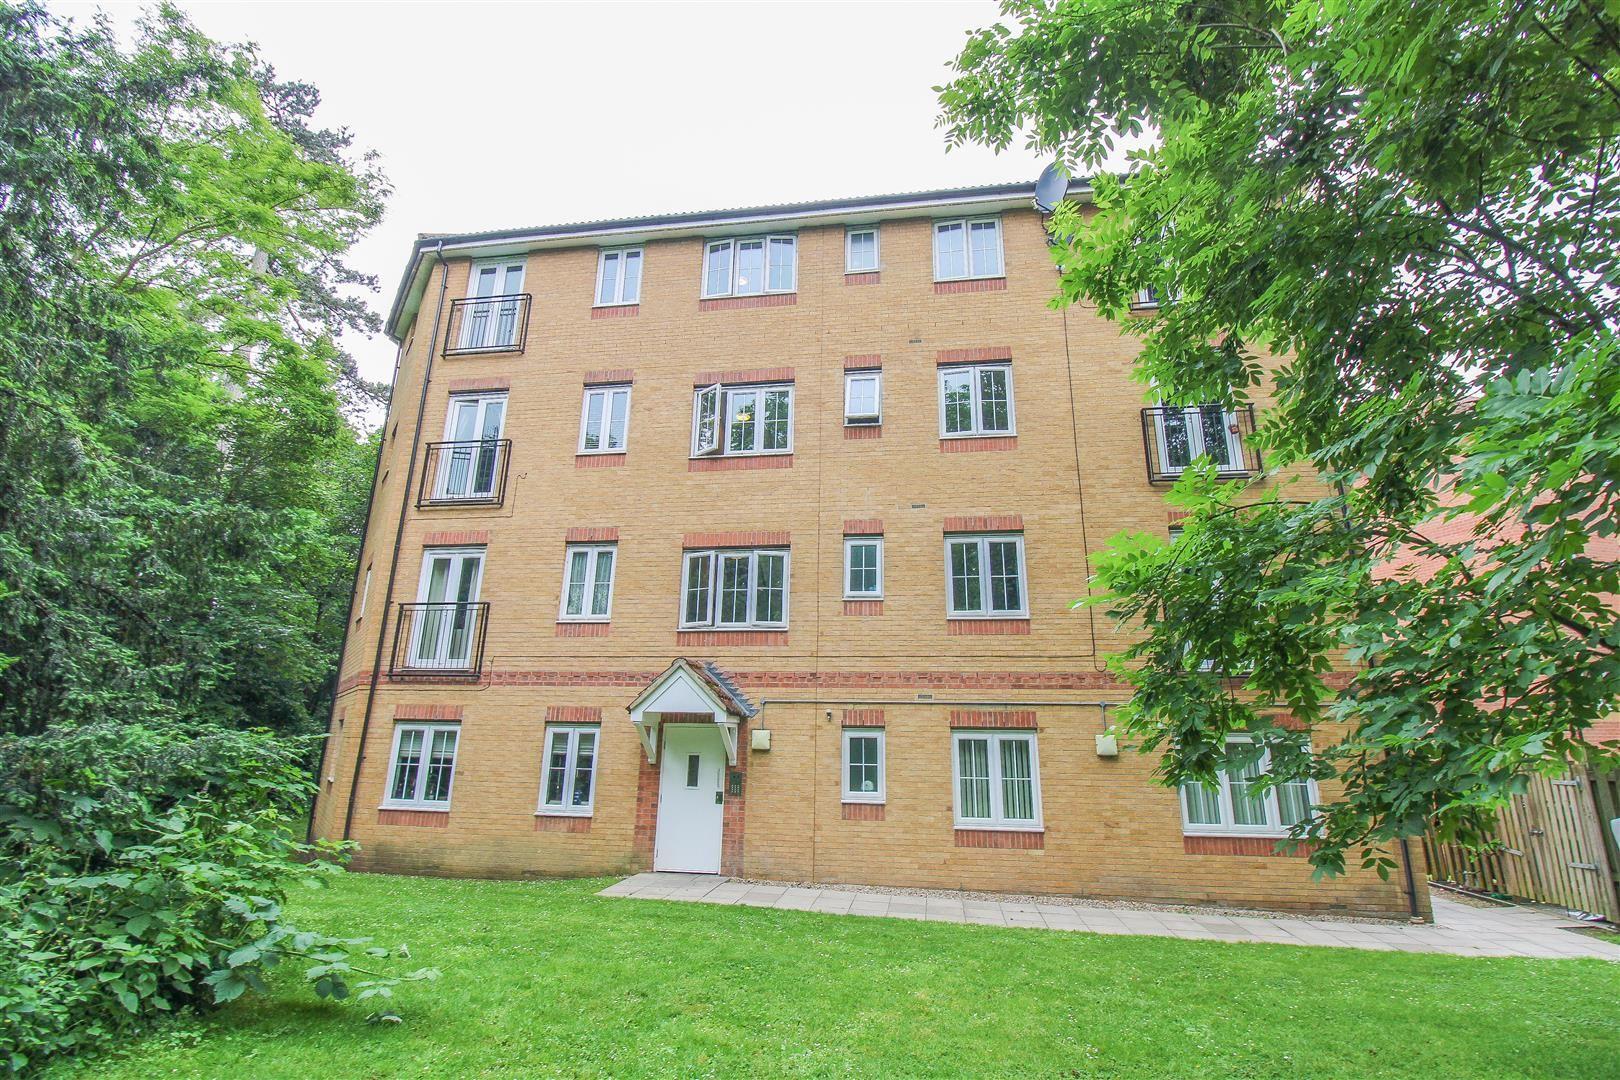 Property photo 1 of 5. Img_3414.Jpg